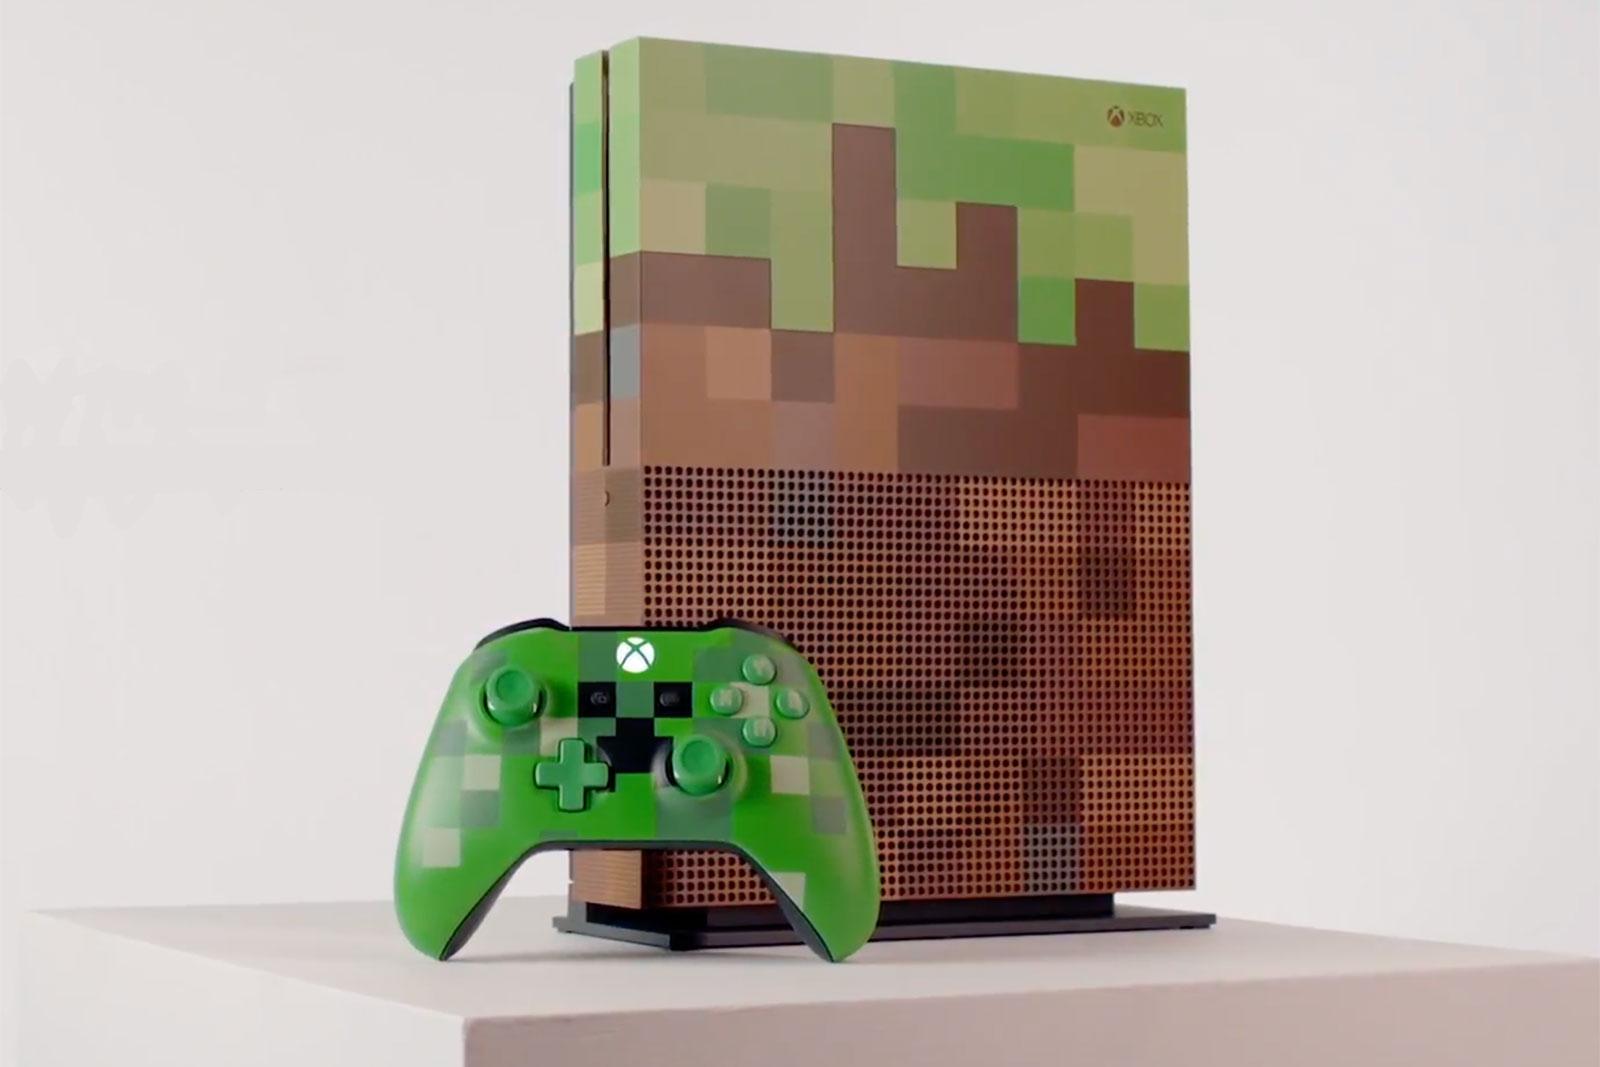 Microsoft unveils 'Minecraft' edition Xbox One S